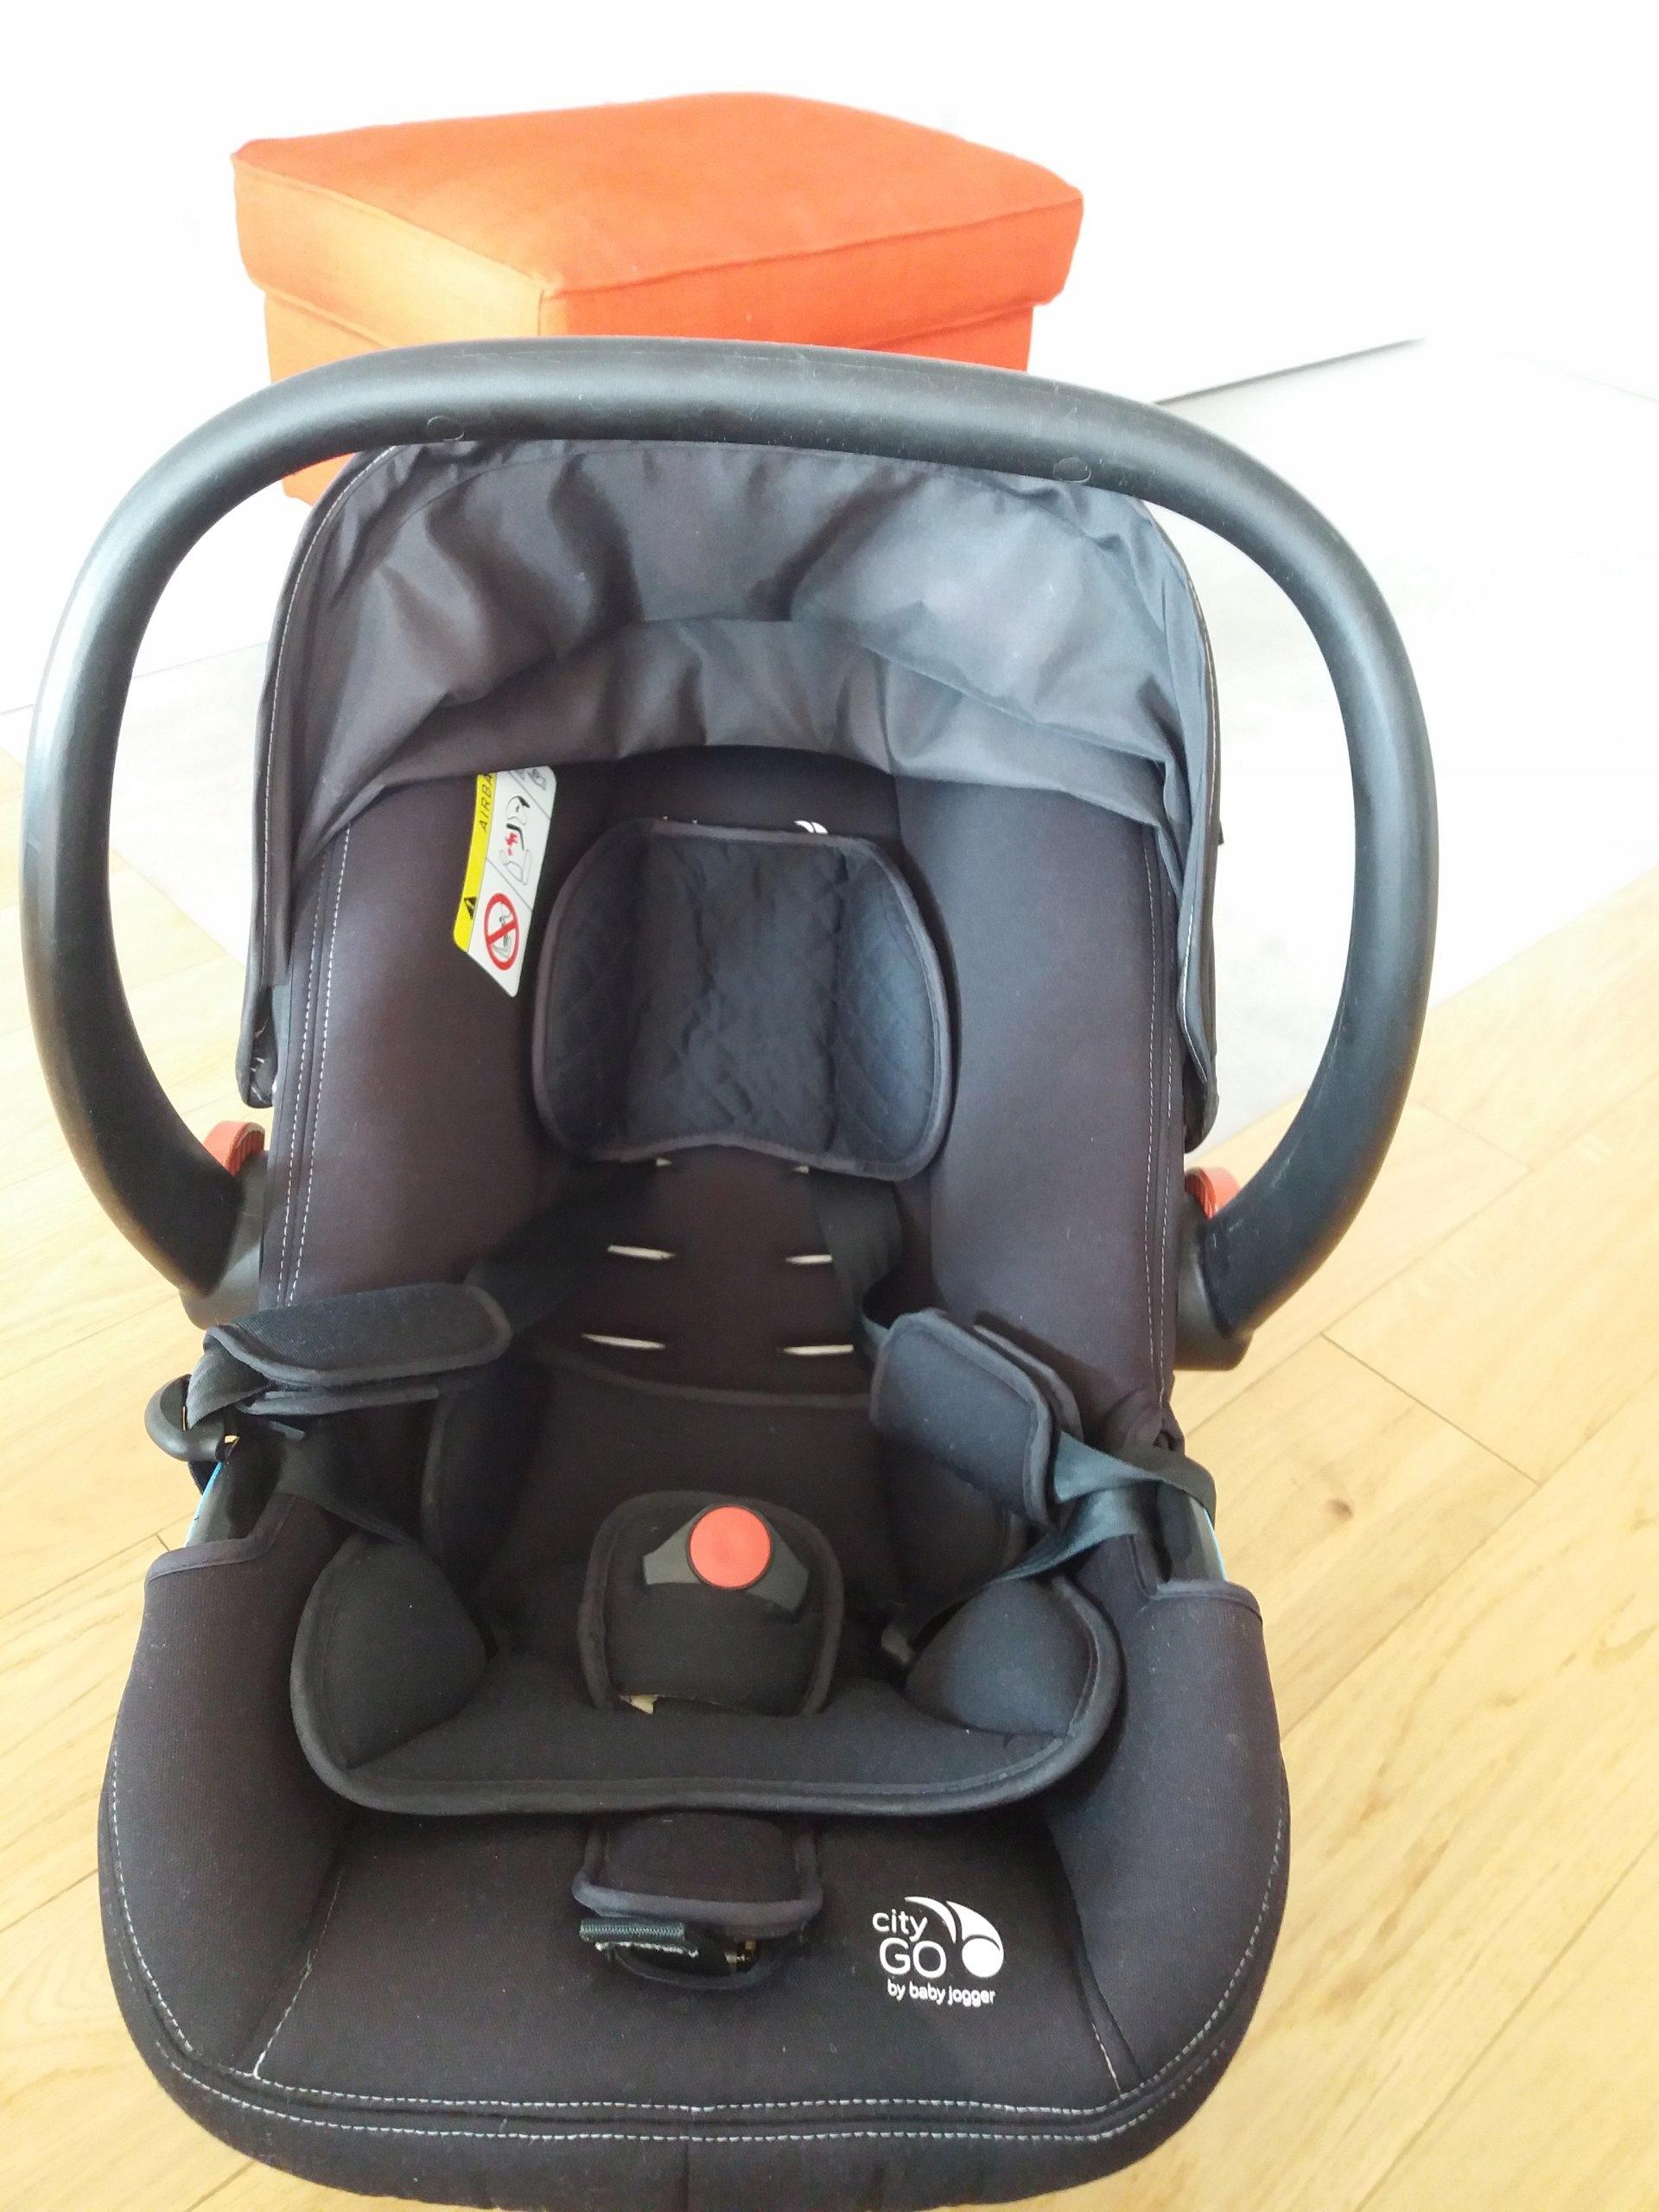 fotelik nosidełko Baby Jogger City Go + adaptery